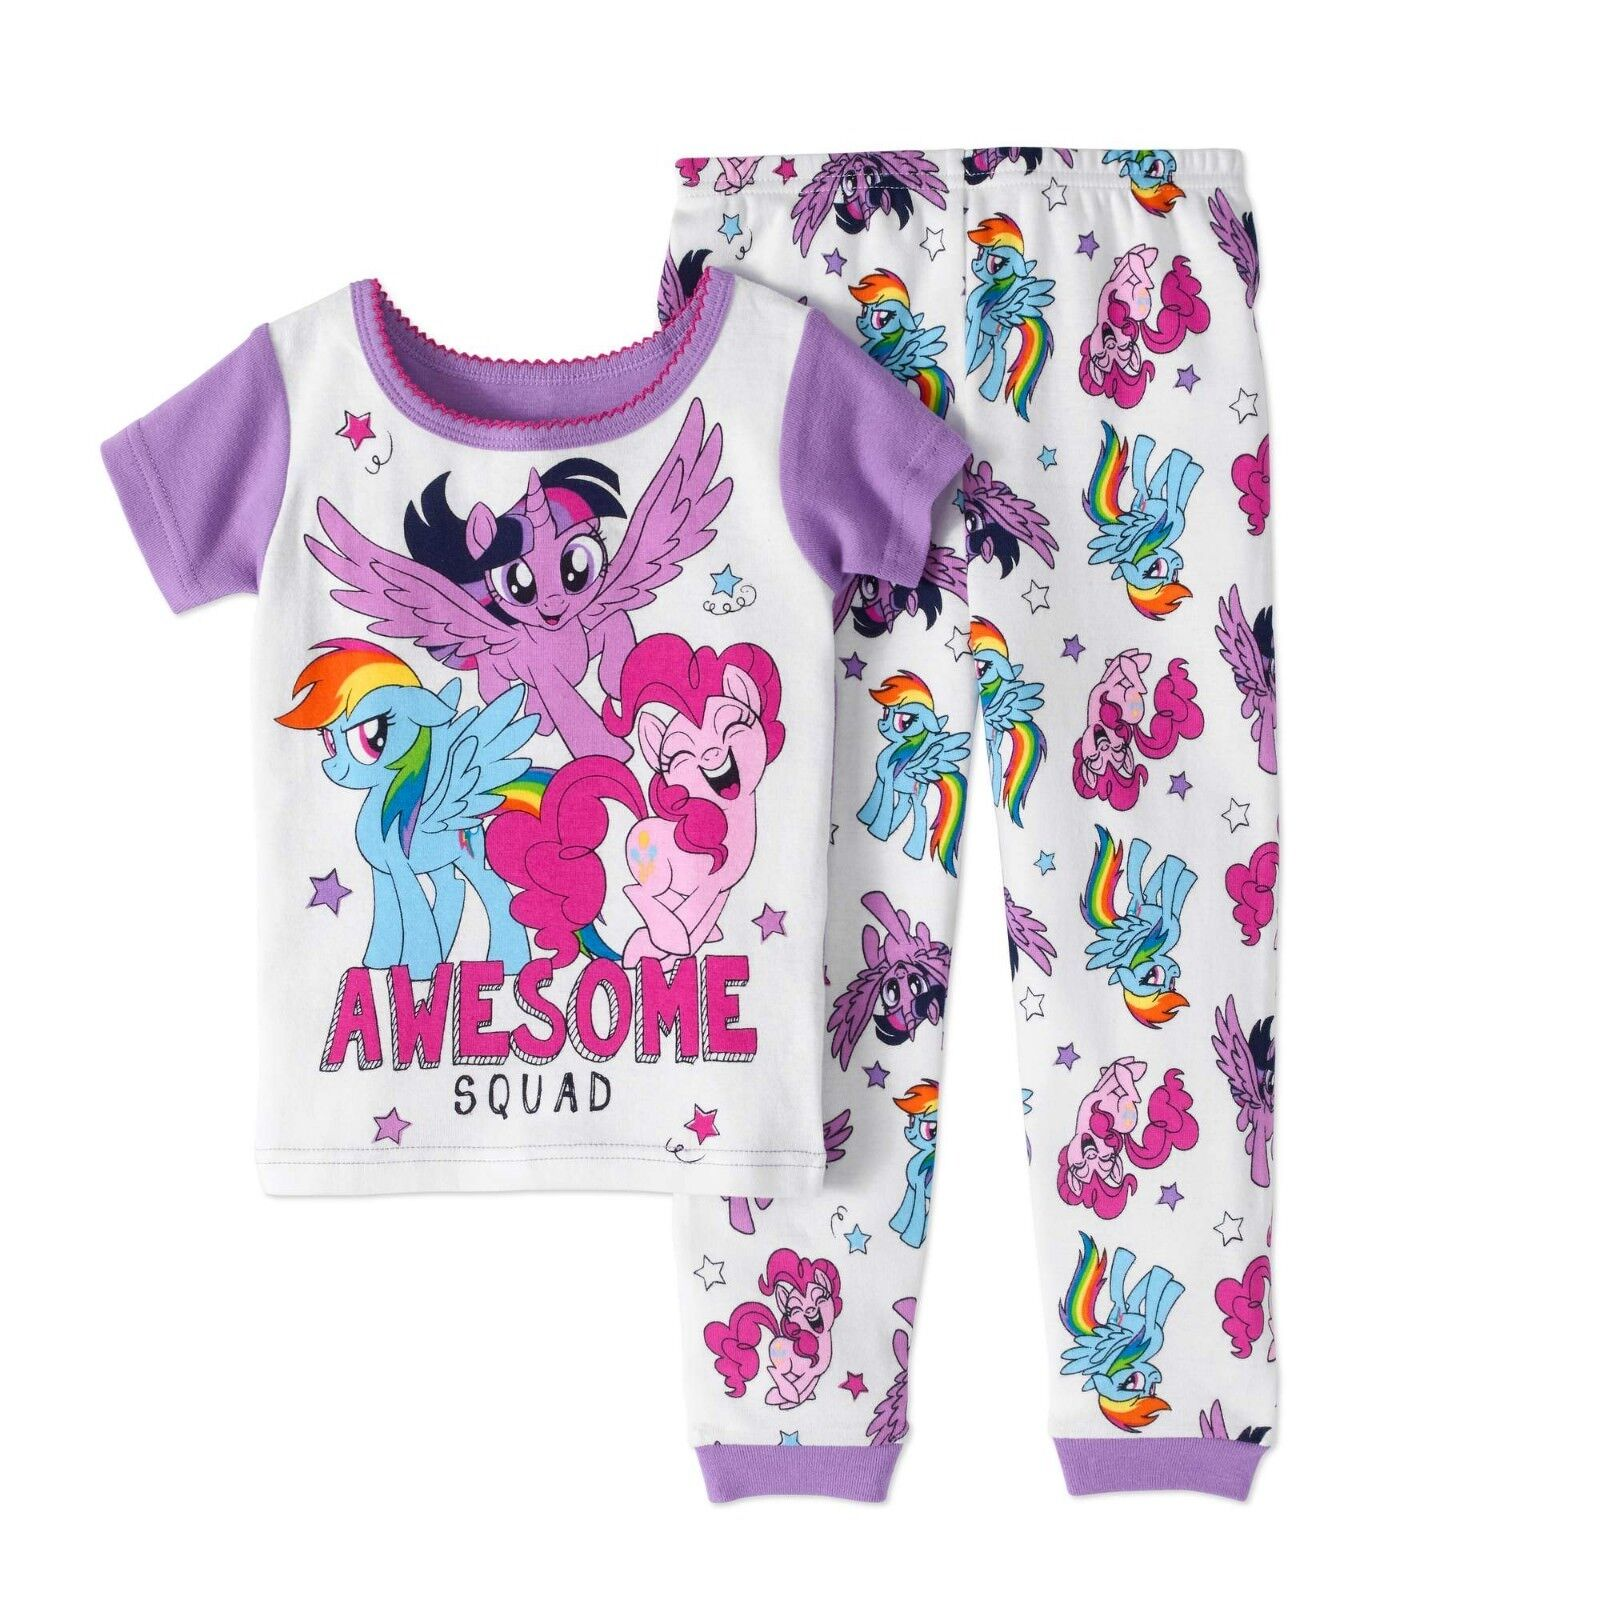 My Little Pony 2 PC Short Sleeve Tight Fit Cotton Pajama Set